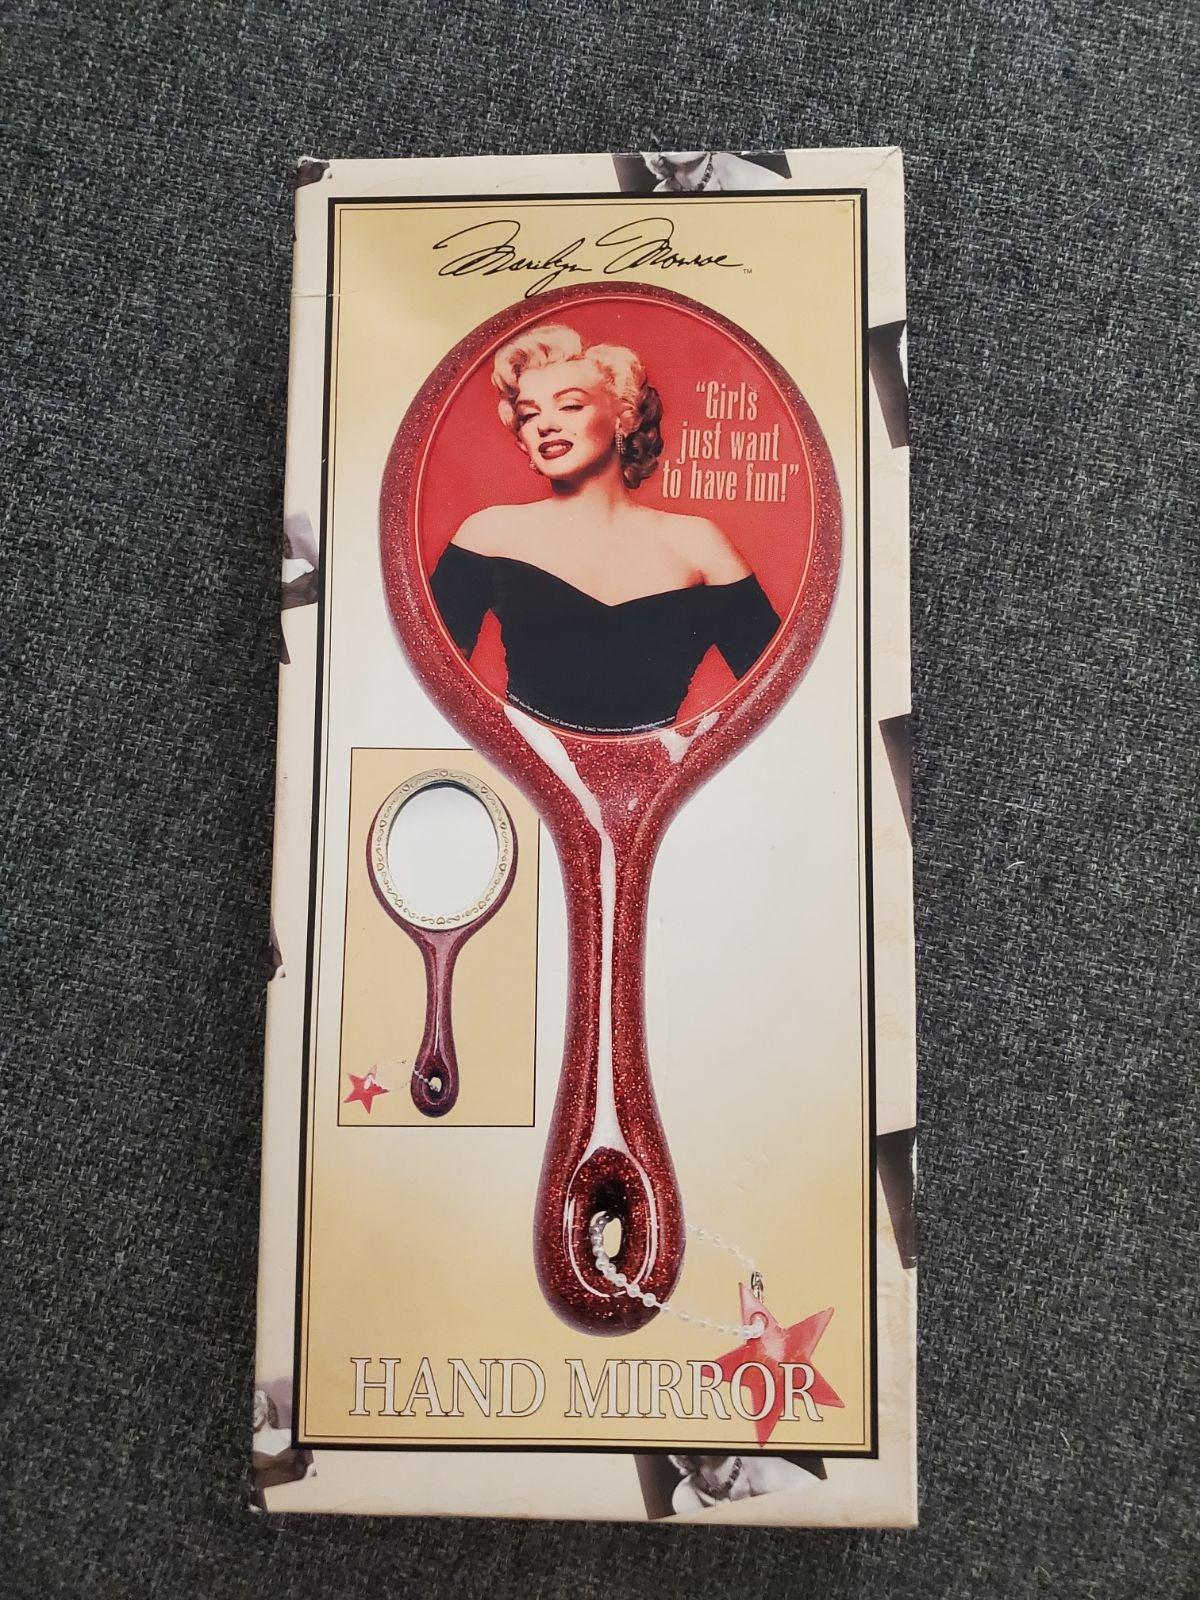 Marilyn Monroe hand mirror